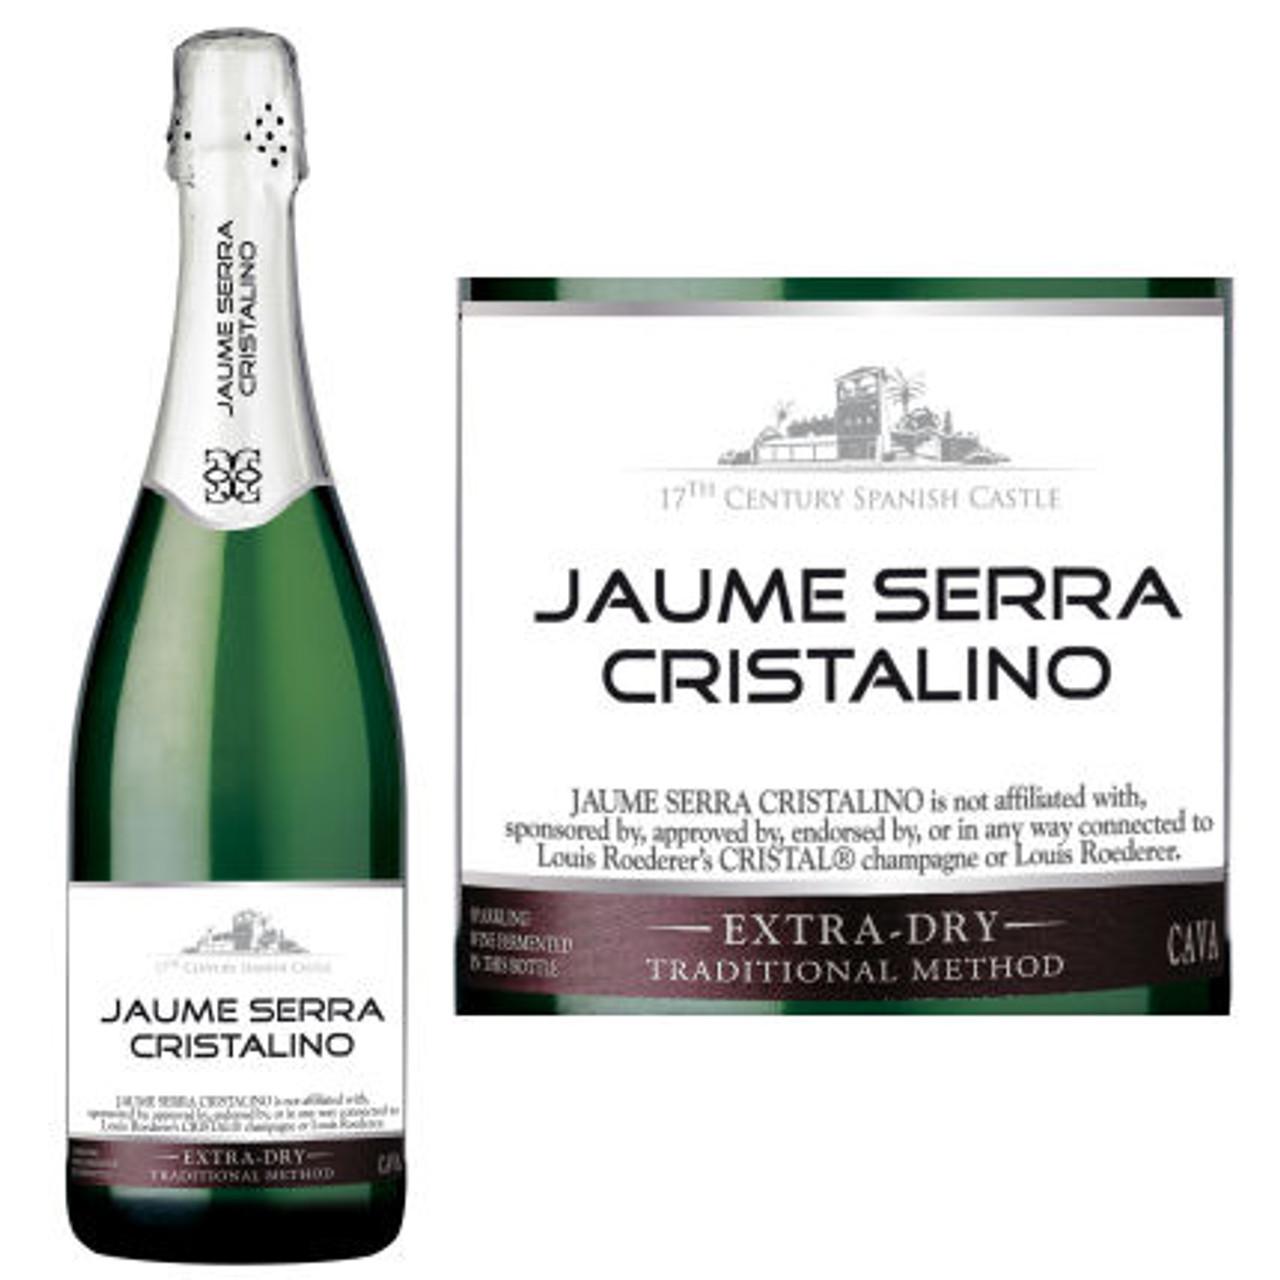 Jaume Serra Cristalino Extra Dry Cava NV Spain